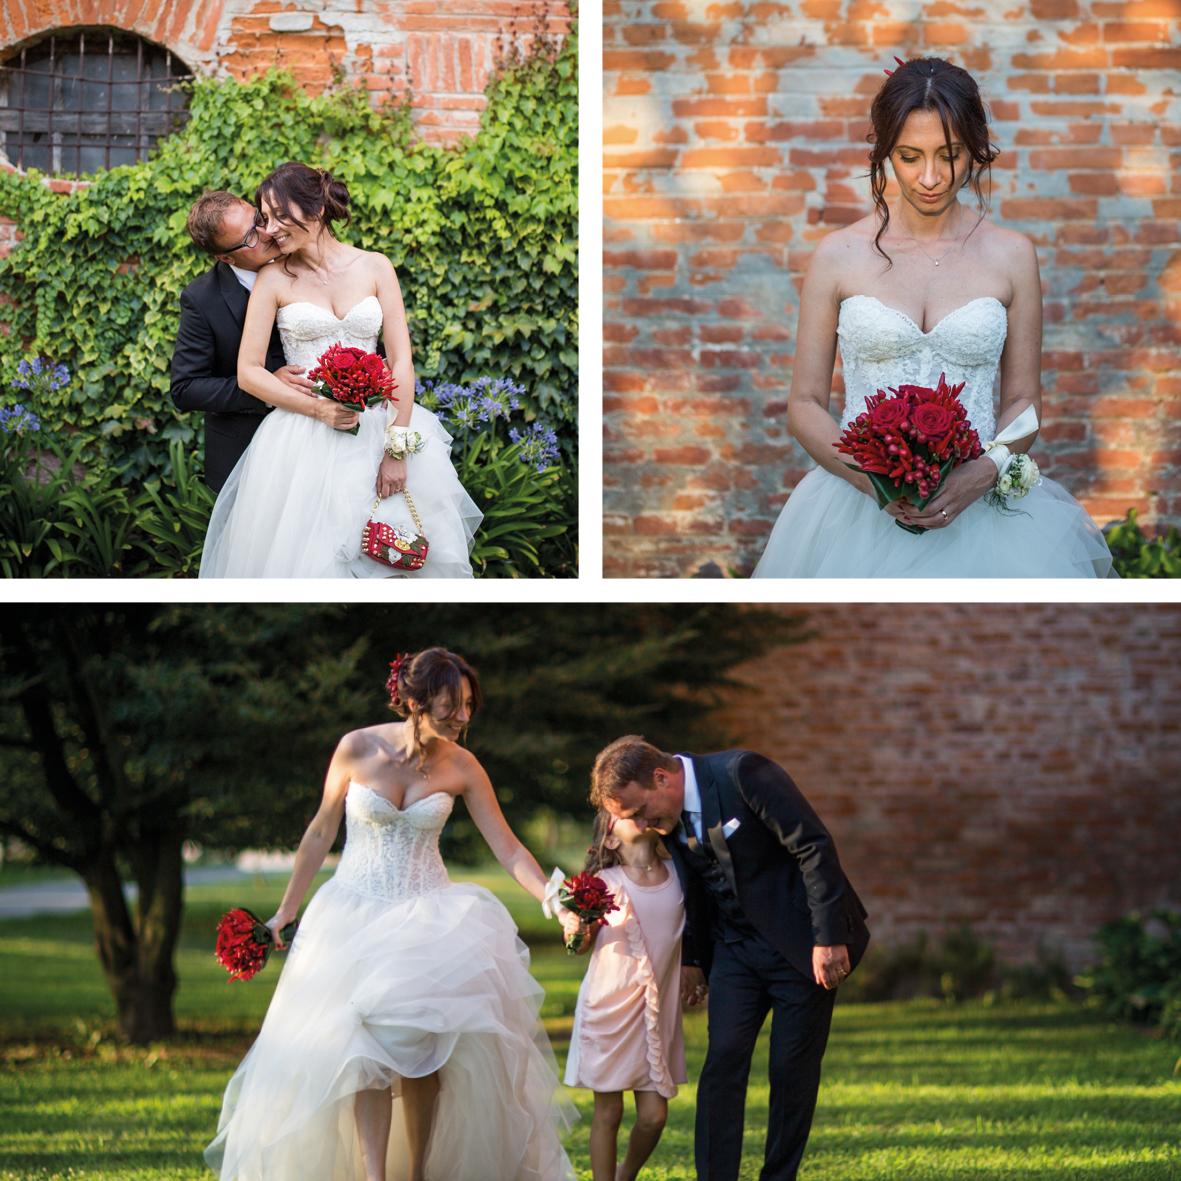 Fotografo matrimonio Brescia wedding reportage Fabiana e Giorgio13